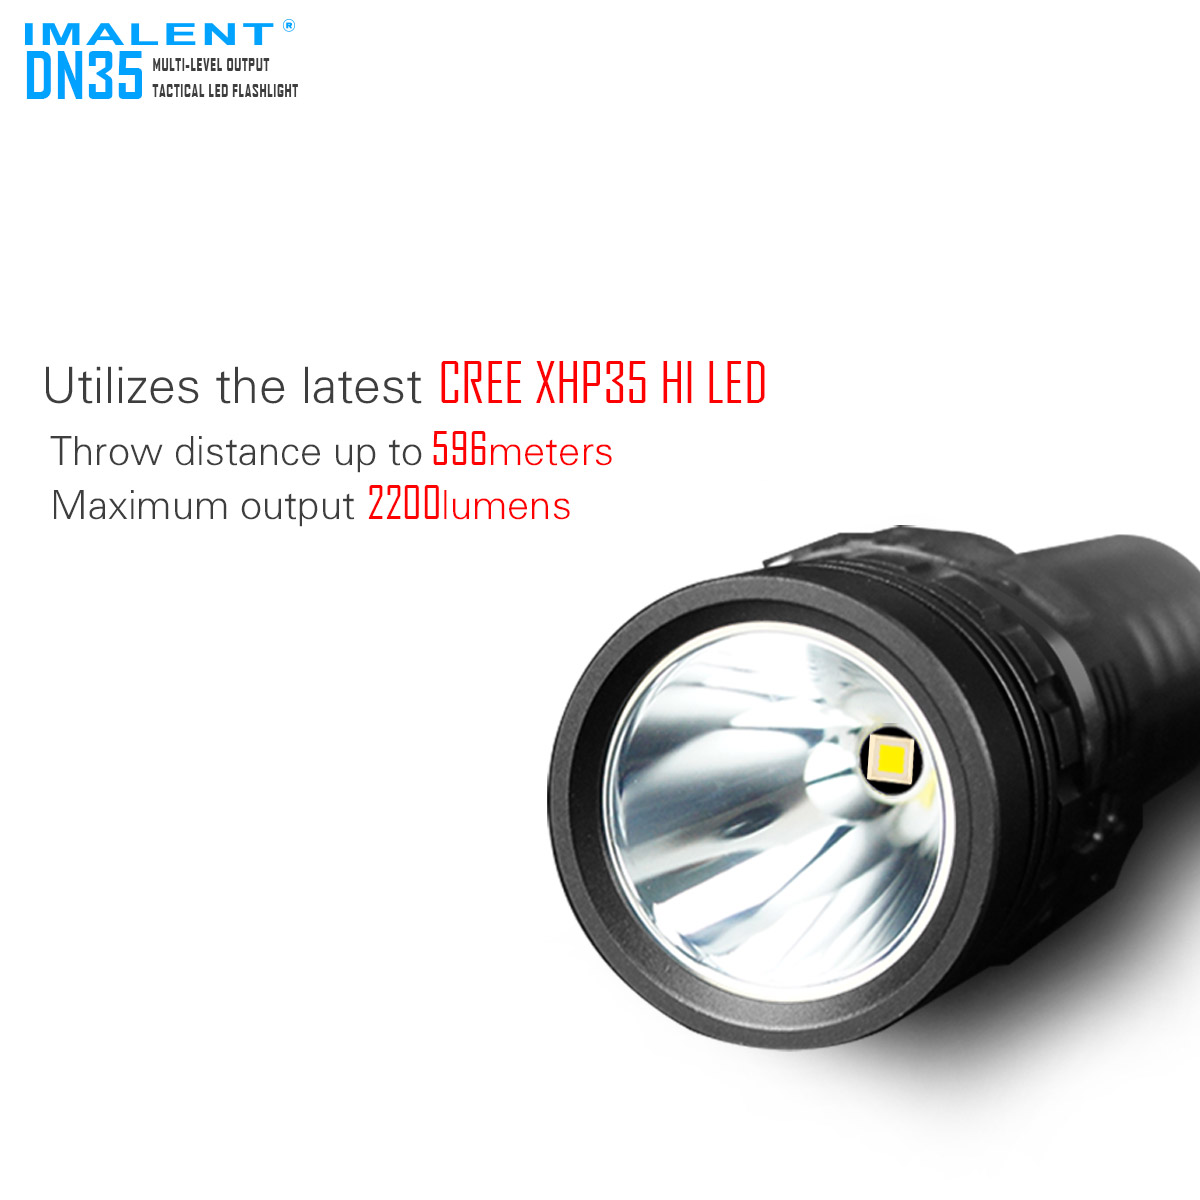 DN35 Linterna LED muy potente